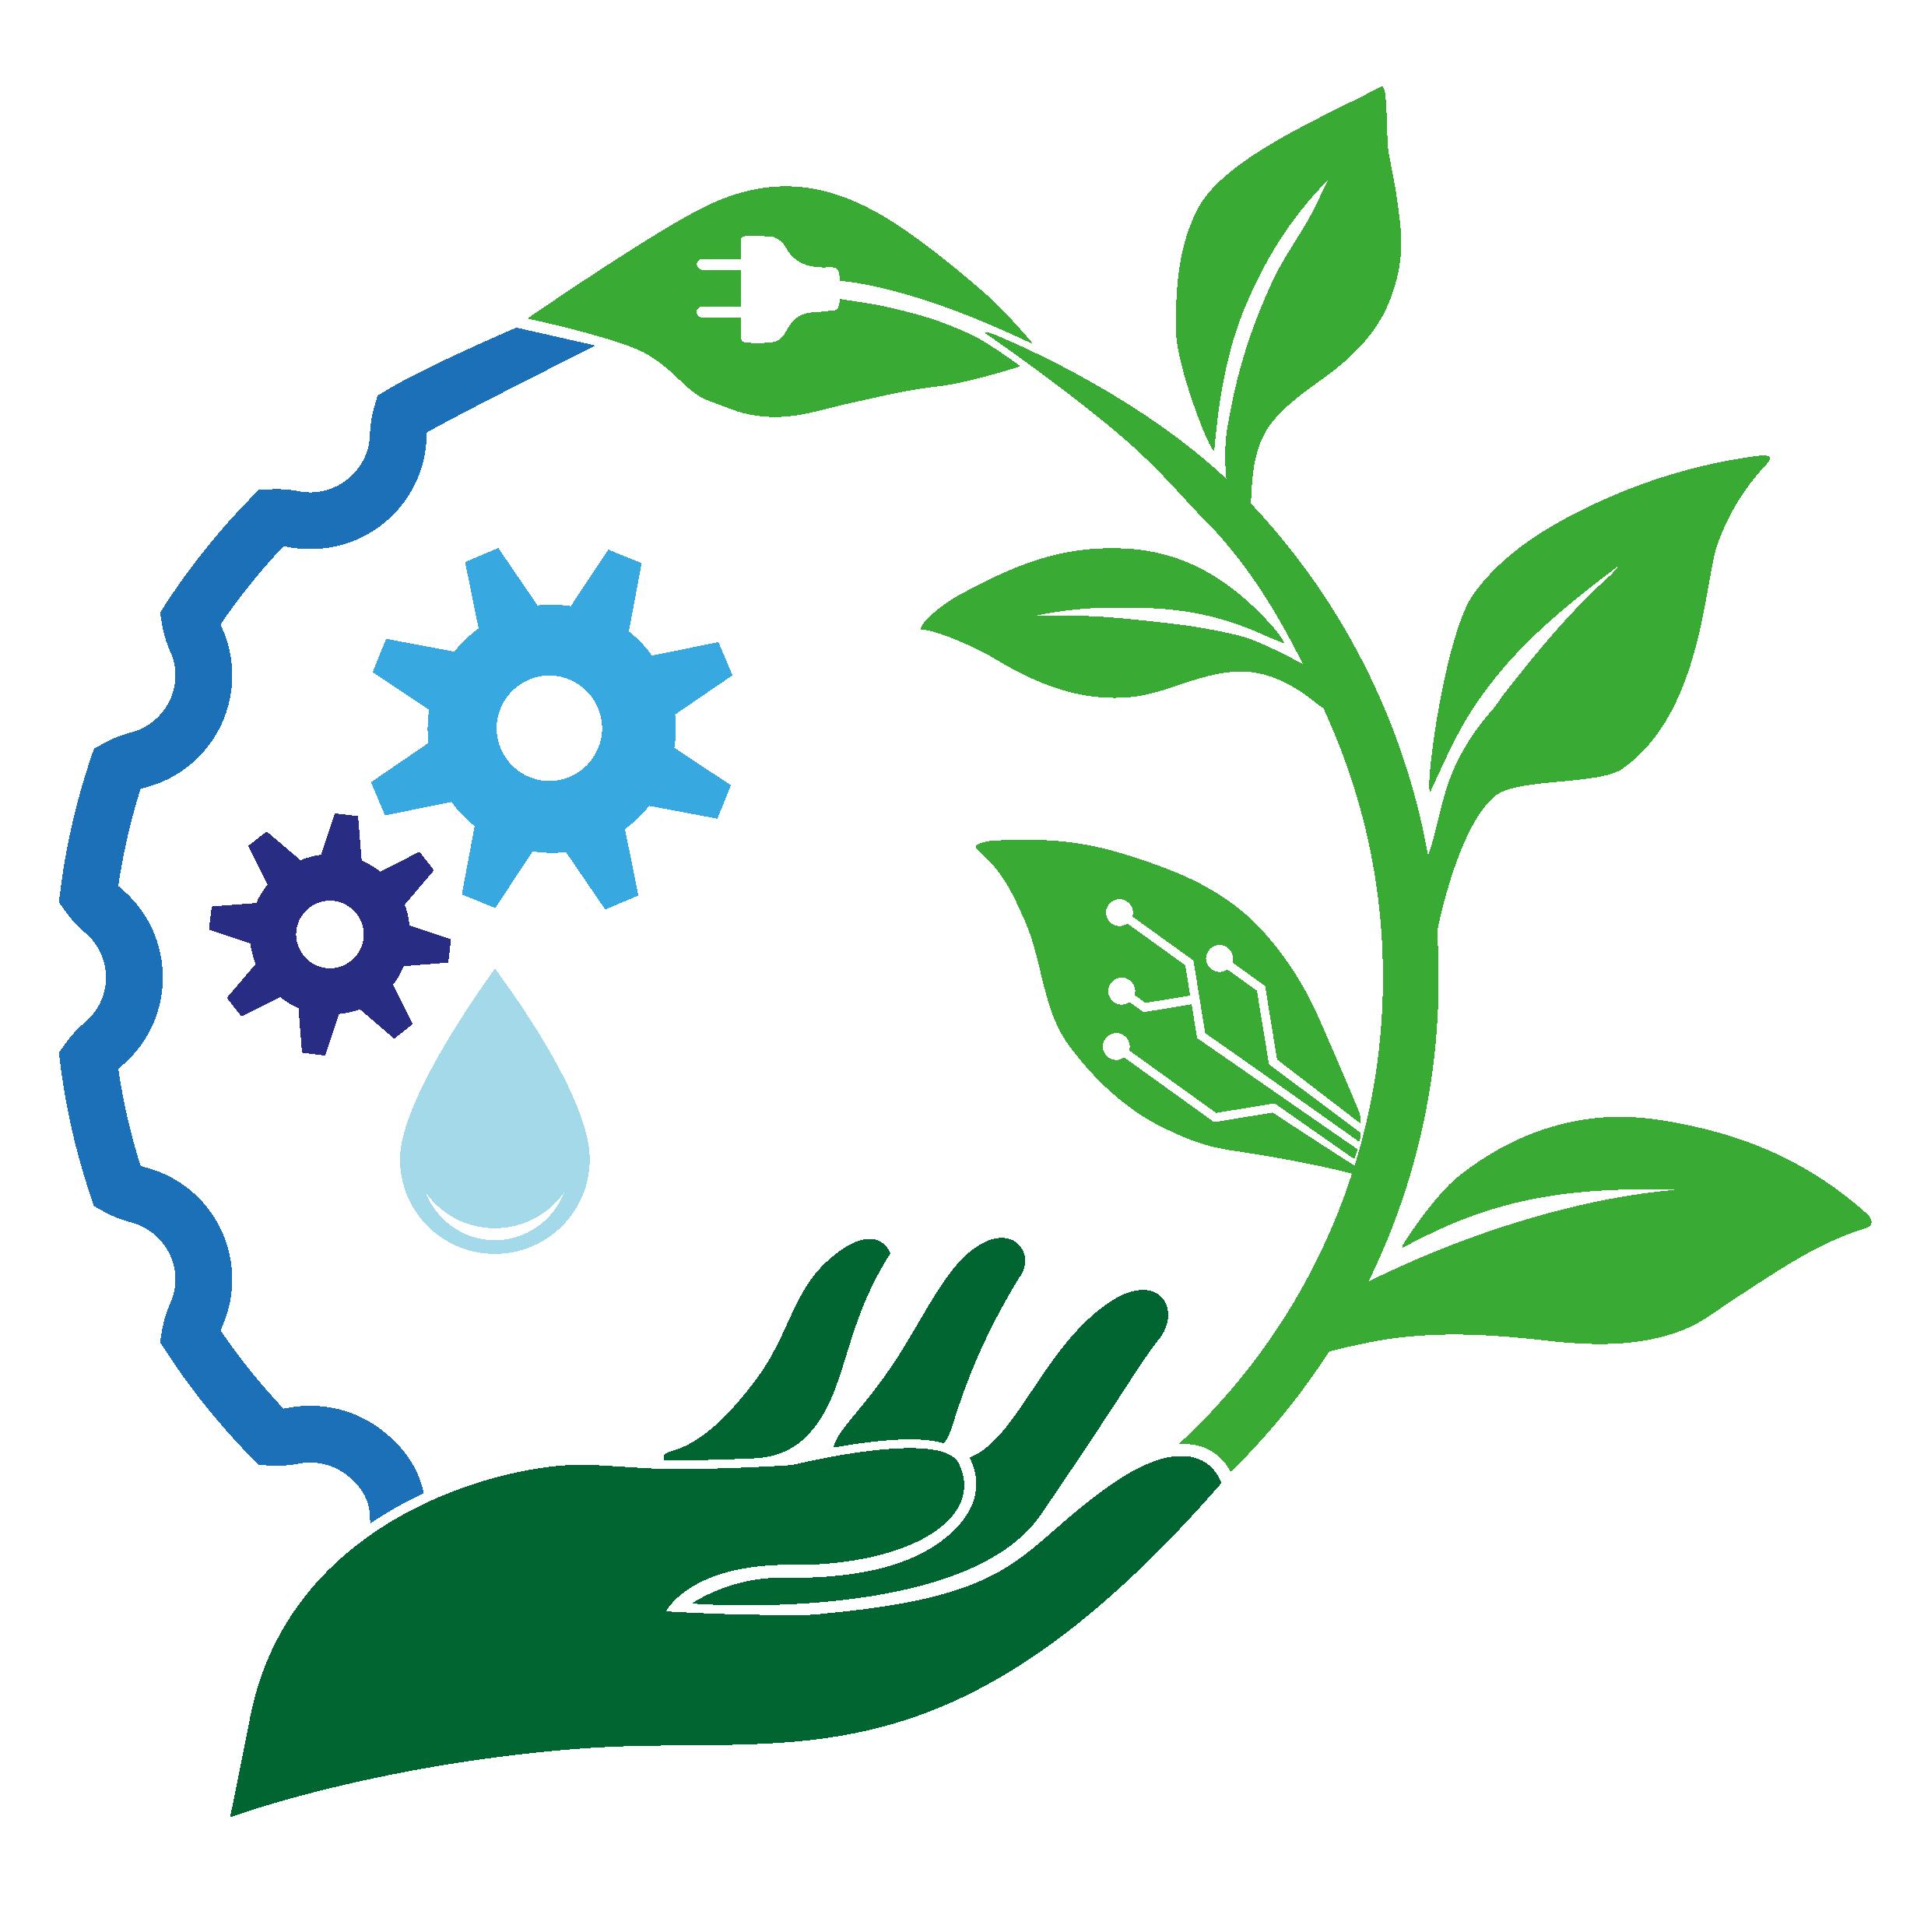 Gartenbautechnik Auerbach